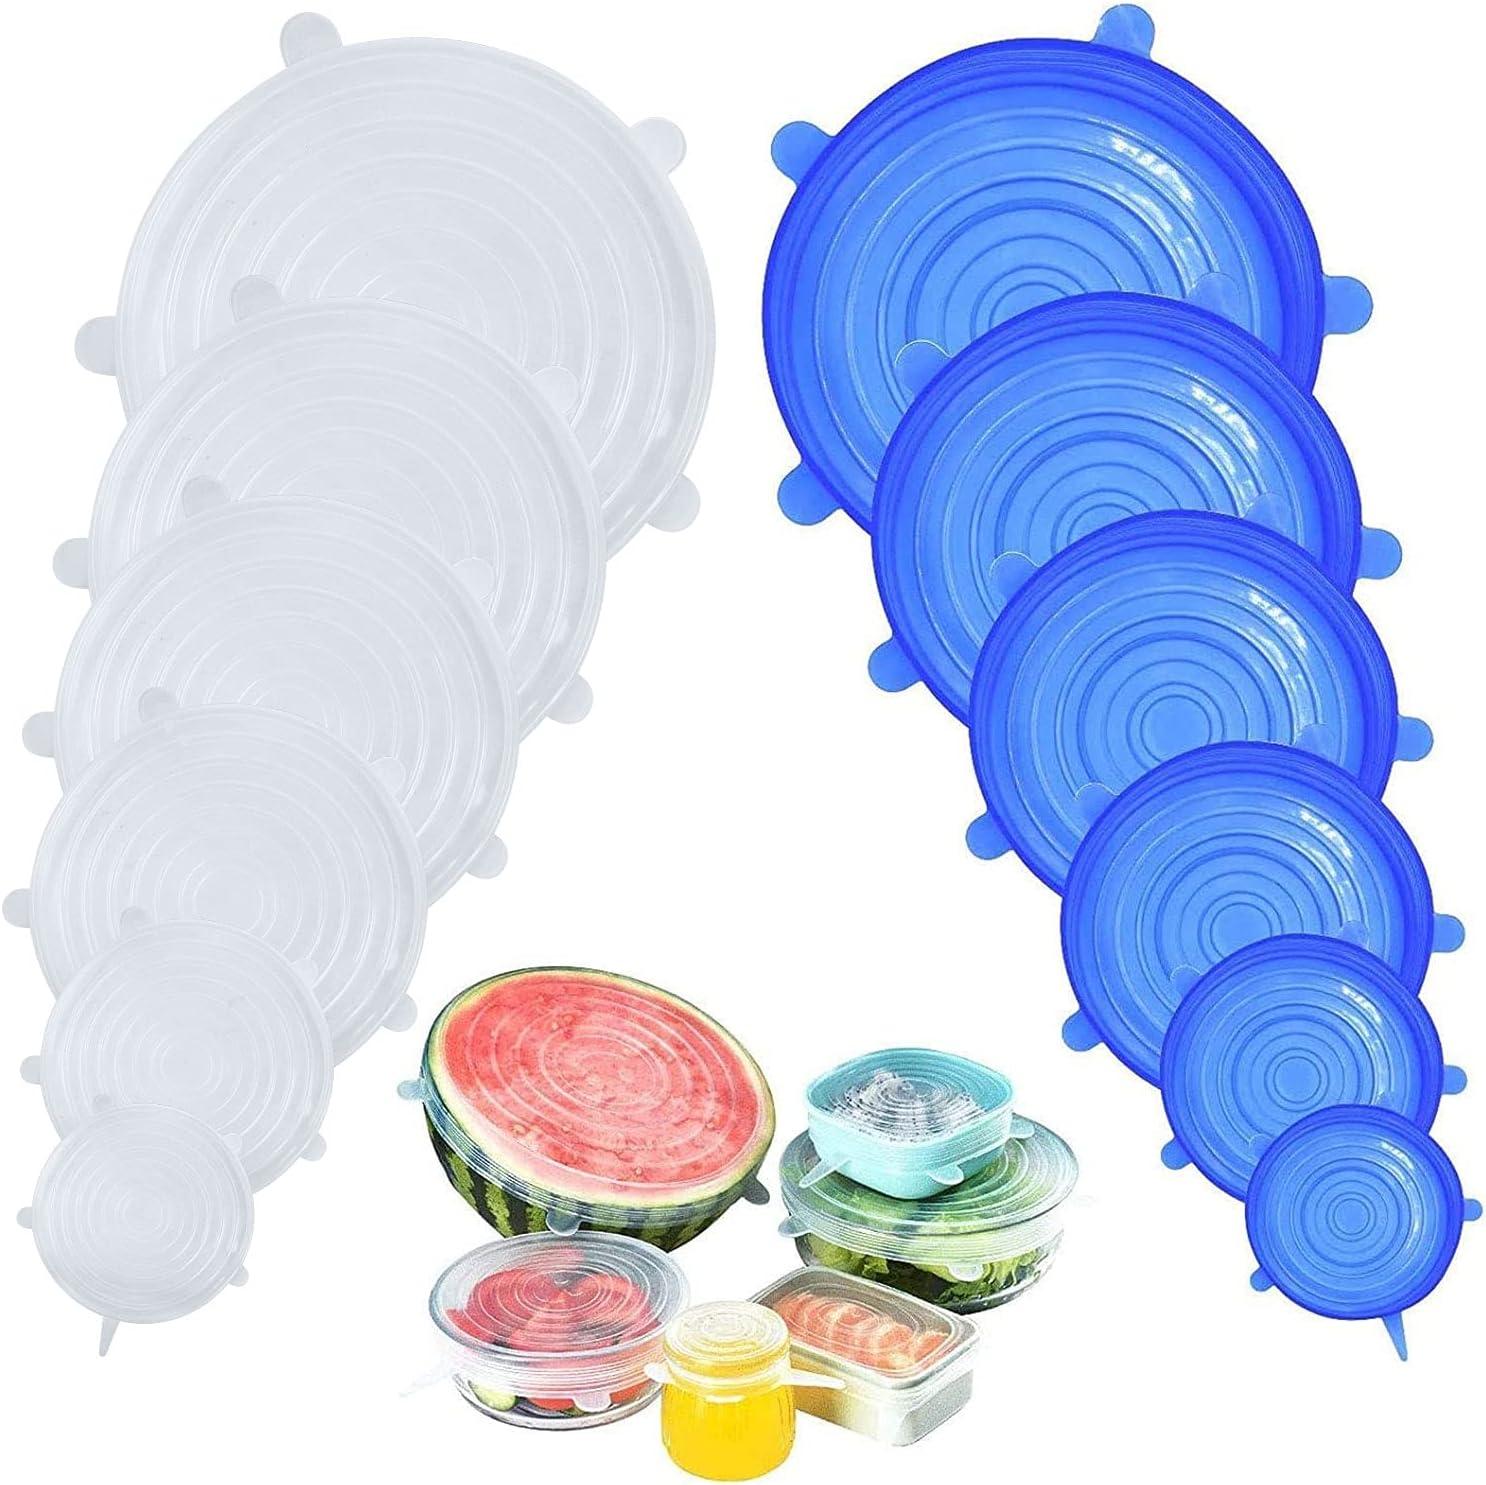 N/ützliches 4PCS Silikon Wraps K/üche Dichtung Deckel Stretch Cling Film FreshDish Nahrungsmittelschutz Recycelbar Werkzeuge